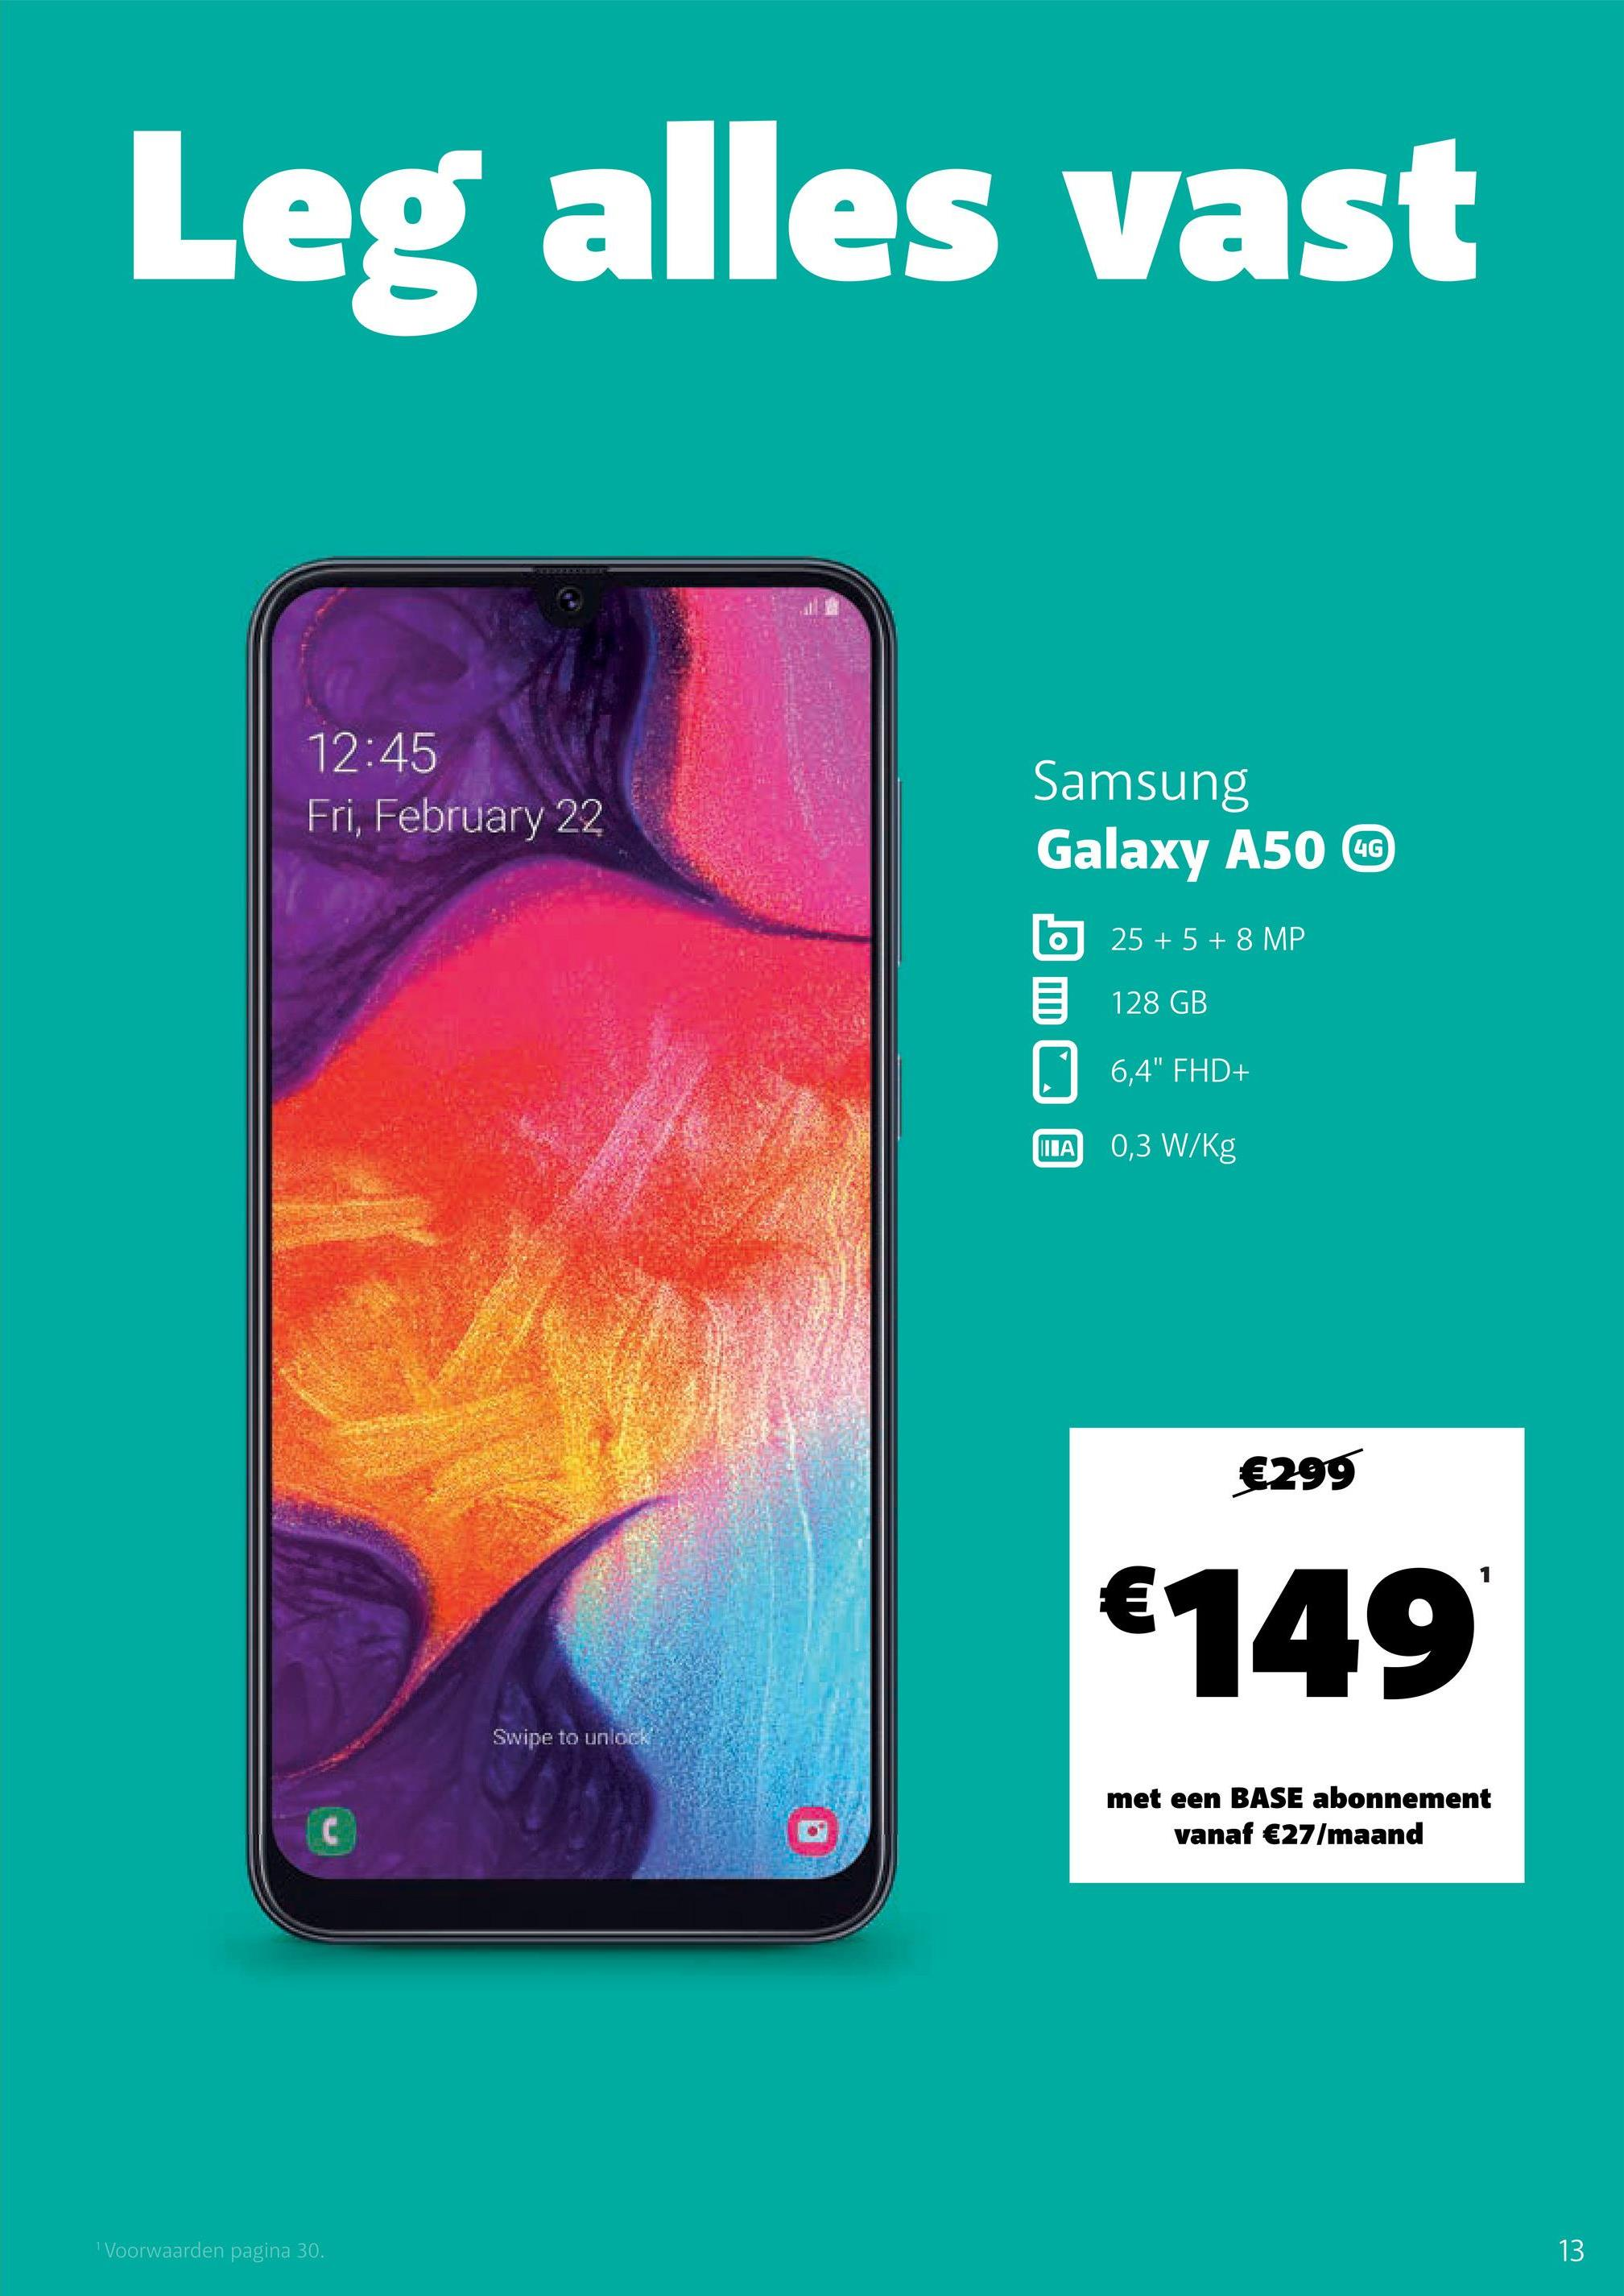 "Leg alles vast 12:45 Fri, February 22 4G Samsung Galaxy A50 CG 25 + 5 + 8 MP < 128 GB 0 6,4"" FHD+ WA 0,3 W/Kg €299 €149 Swipe to unlock met een BASE abonnement vanaf €27/maand ""Voorwaarden pagina 30."